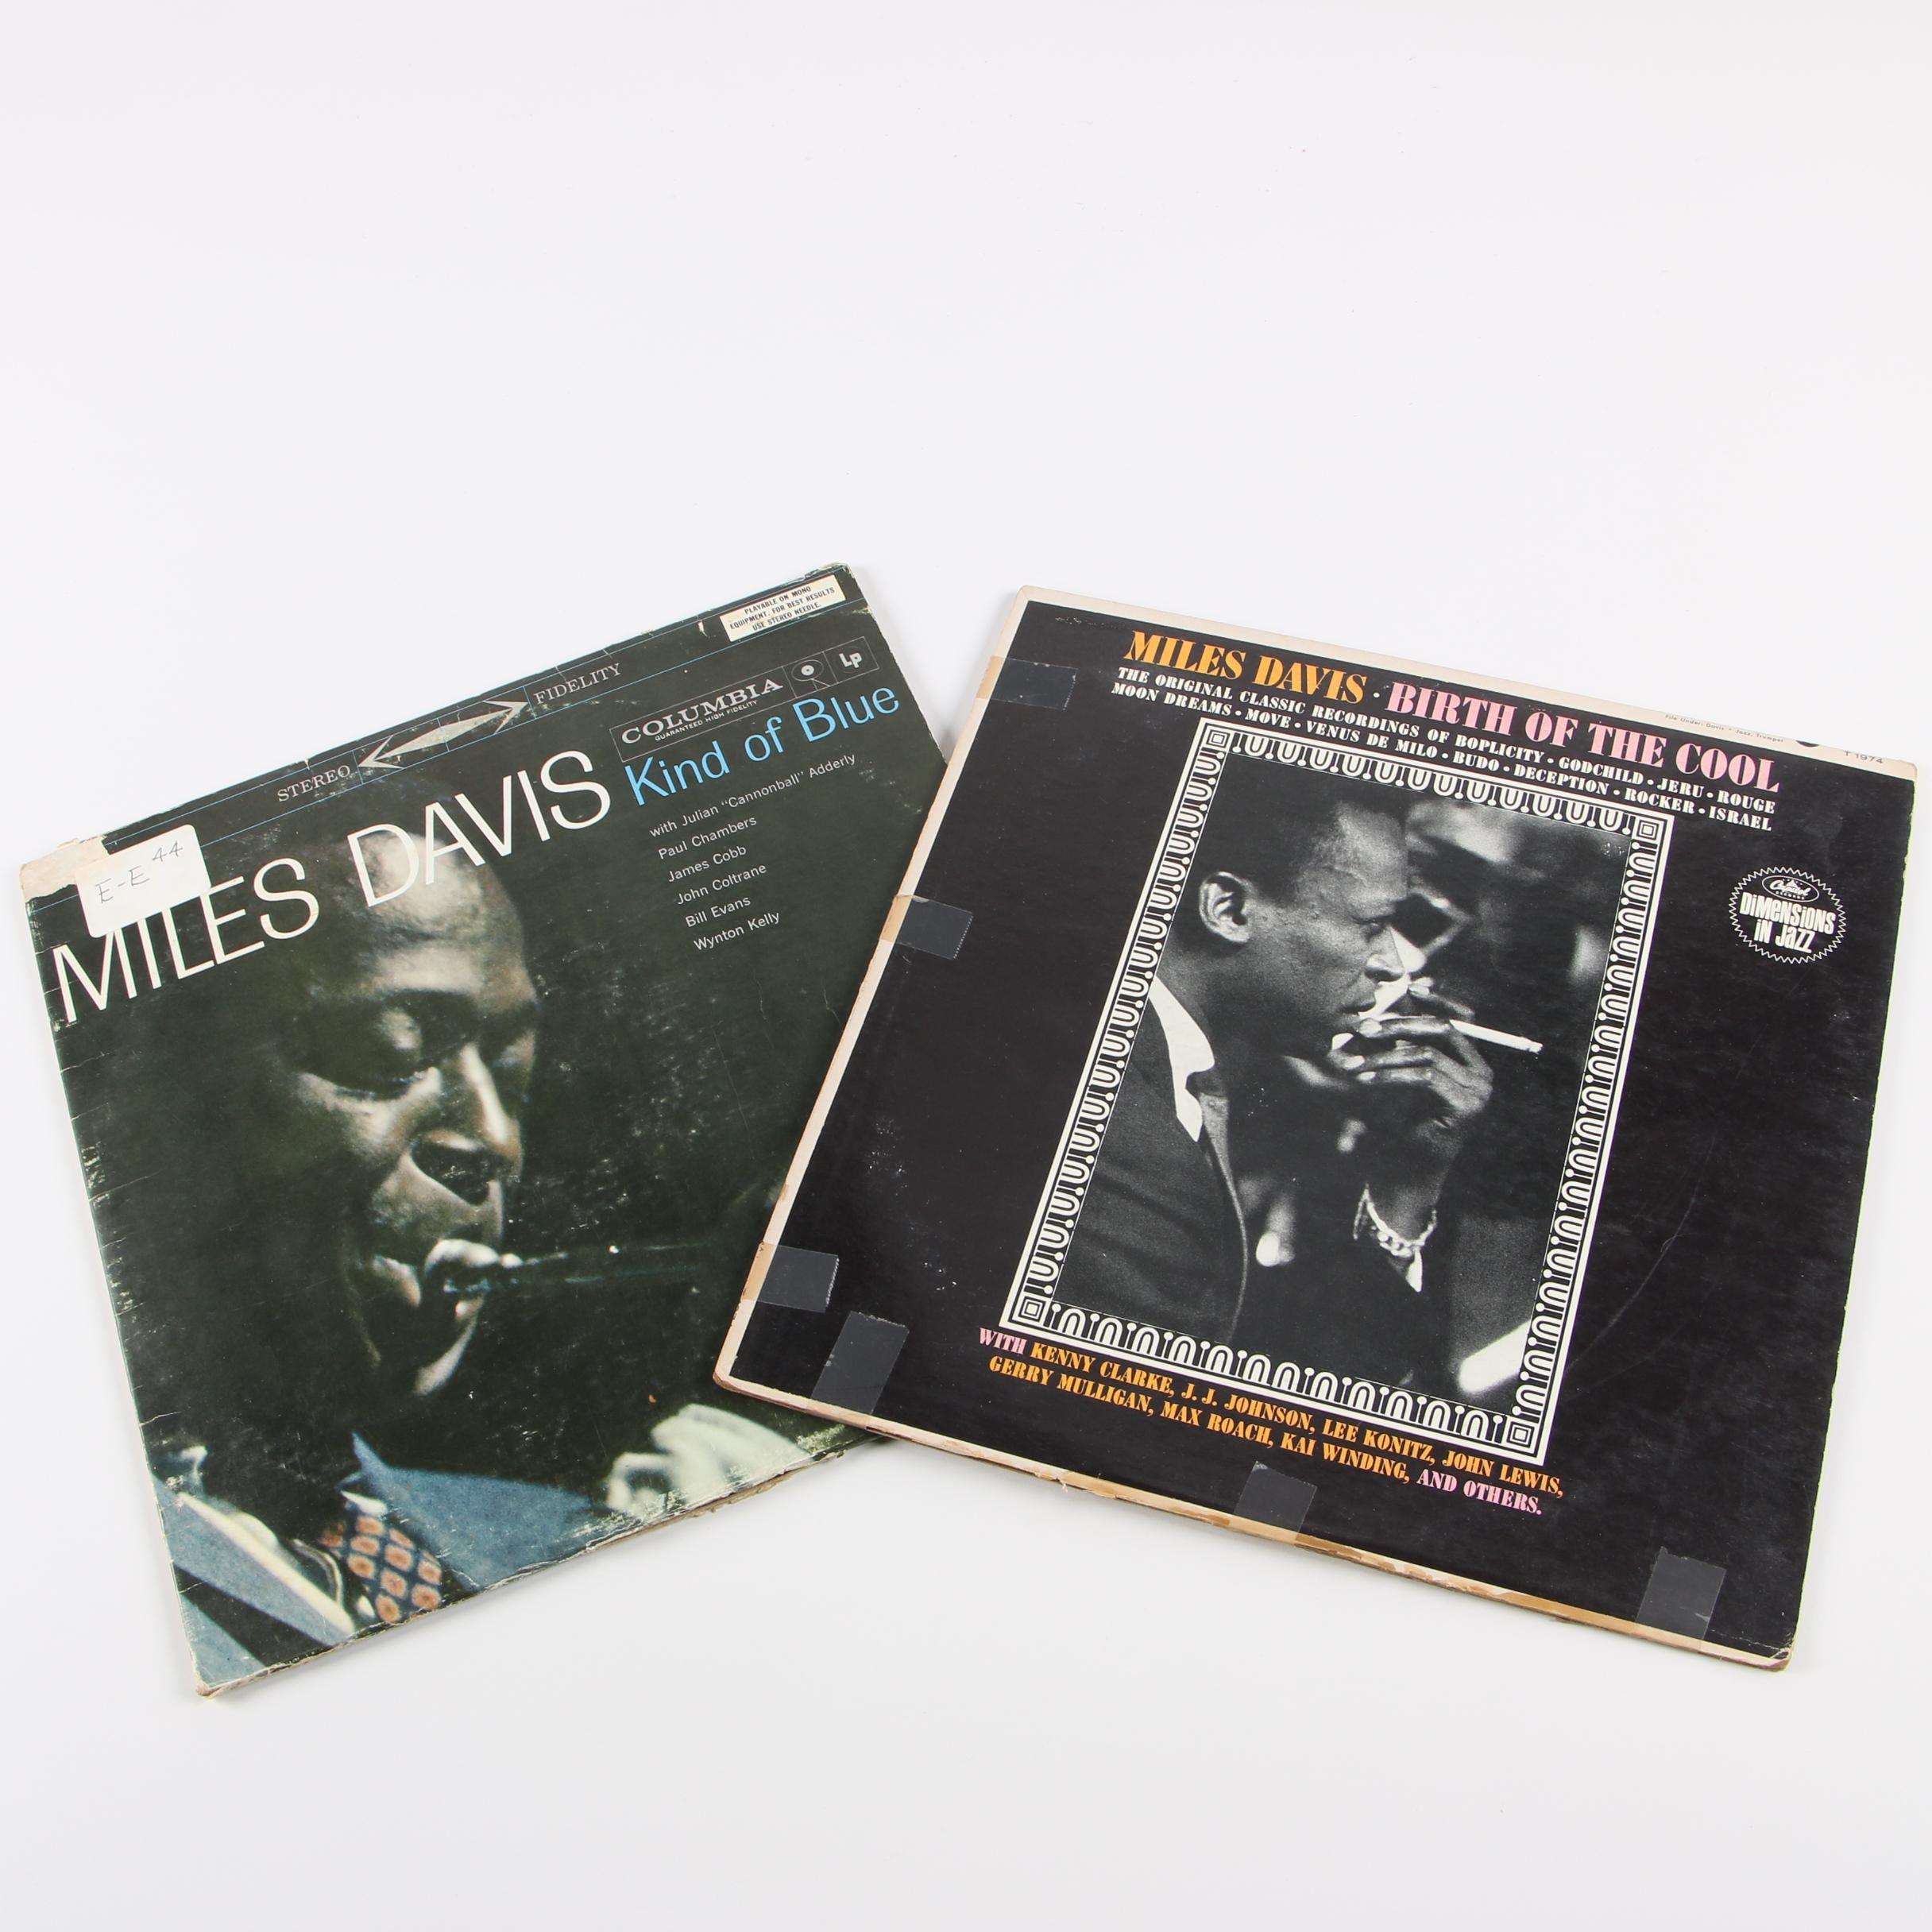 Miles Davis Records